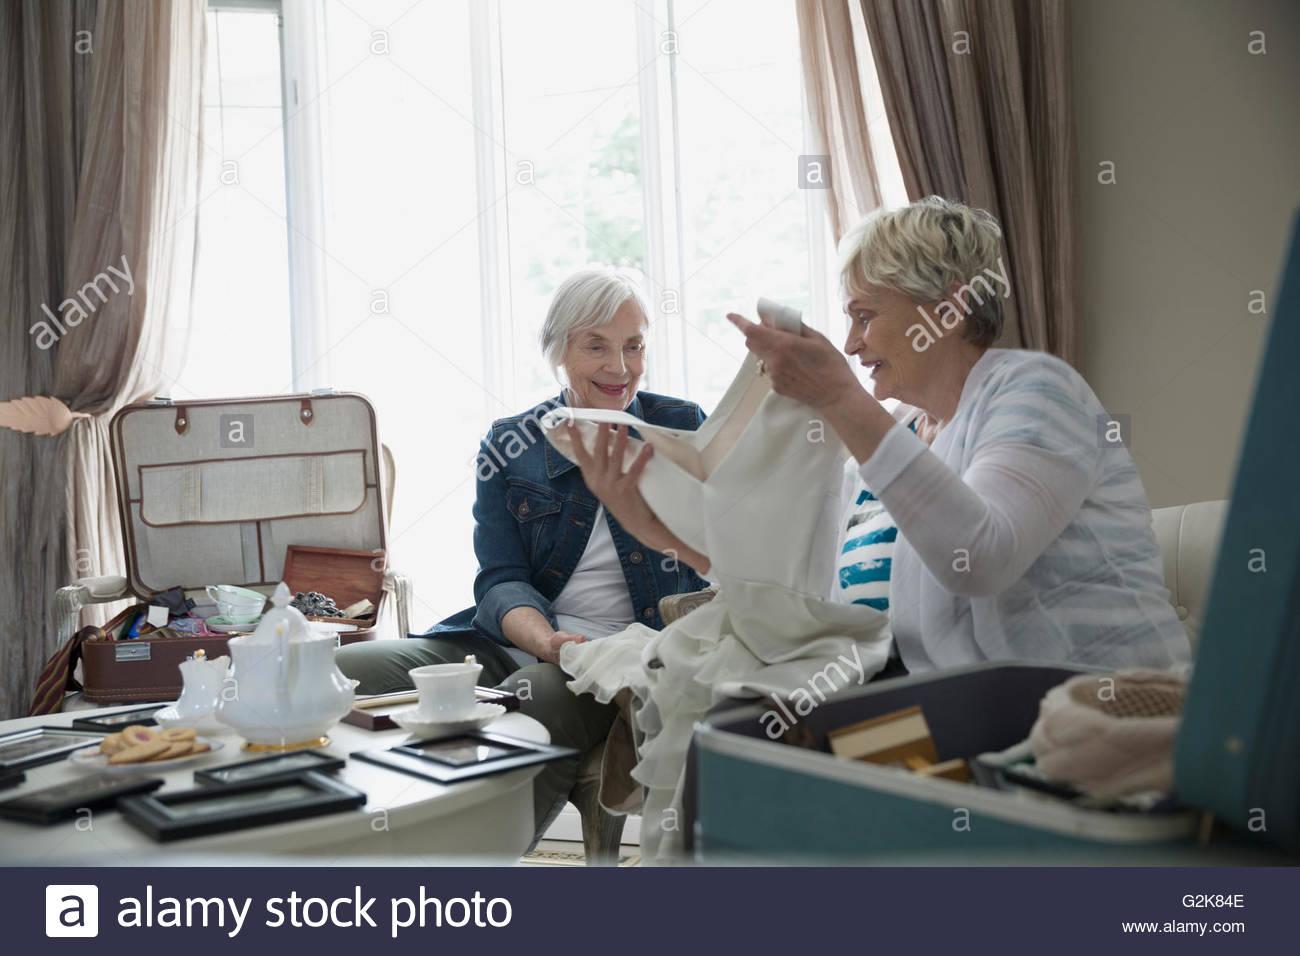 Senior women drinking tea and looking at old wedding dress - Stock Image